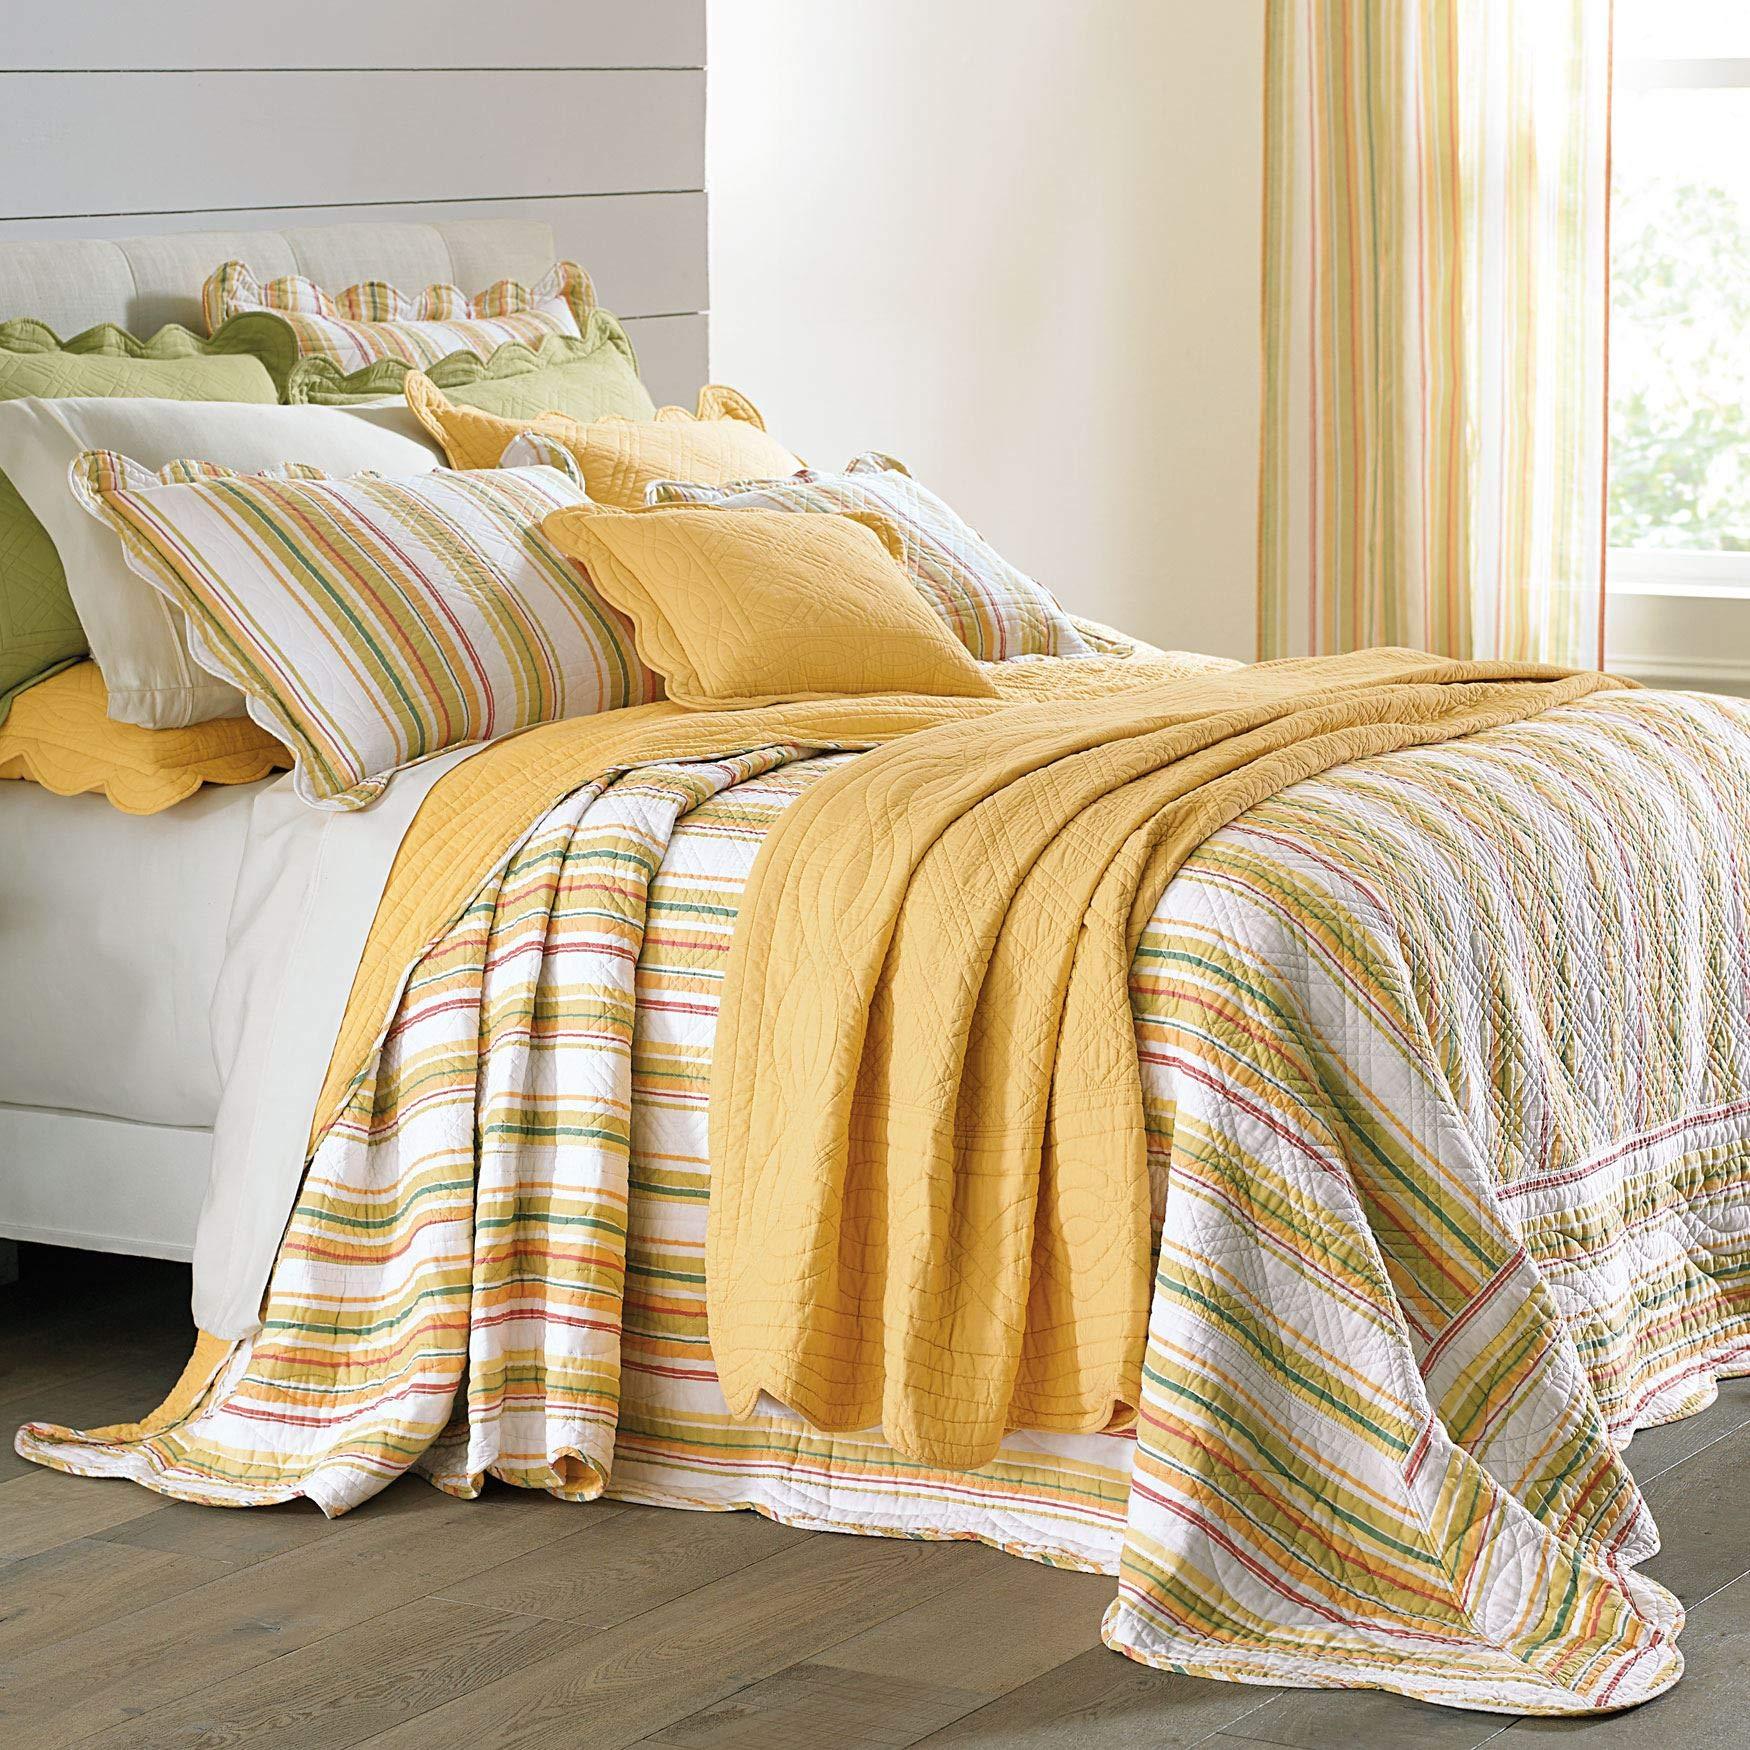 BrylaneHome Florence Oversized Bedspread - Dandelion Stripe, King